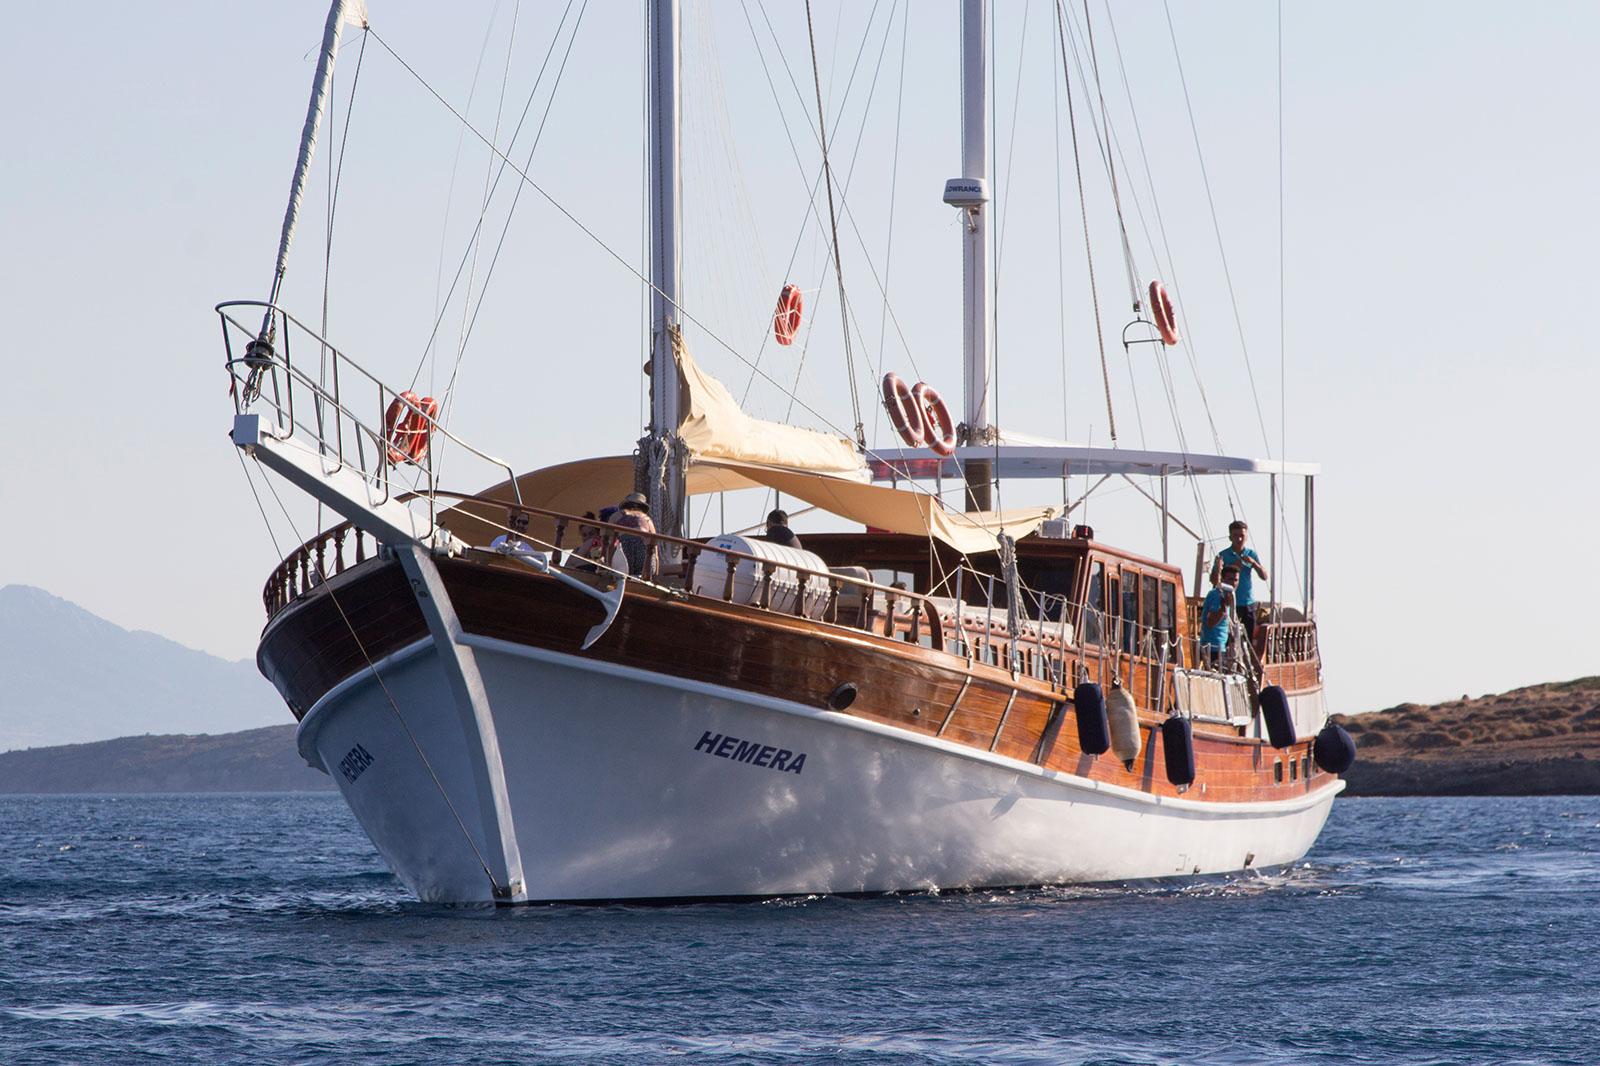 Hera motor sailer custom handcrafted yacht enjoy for Motor boat rental greece